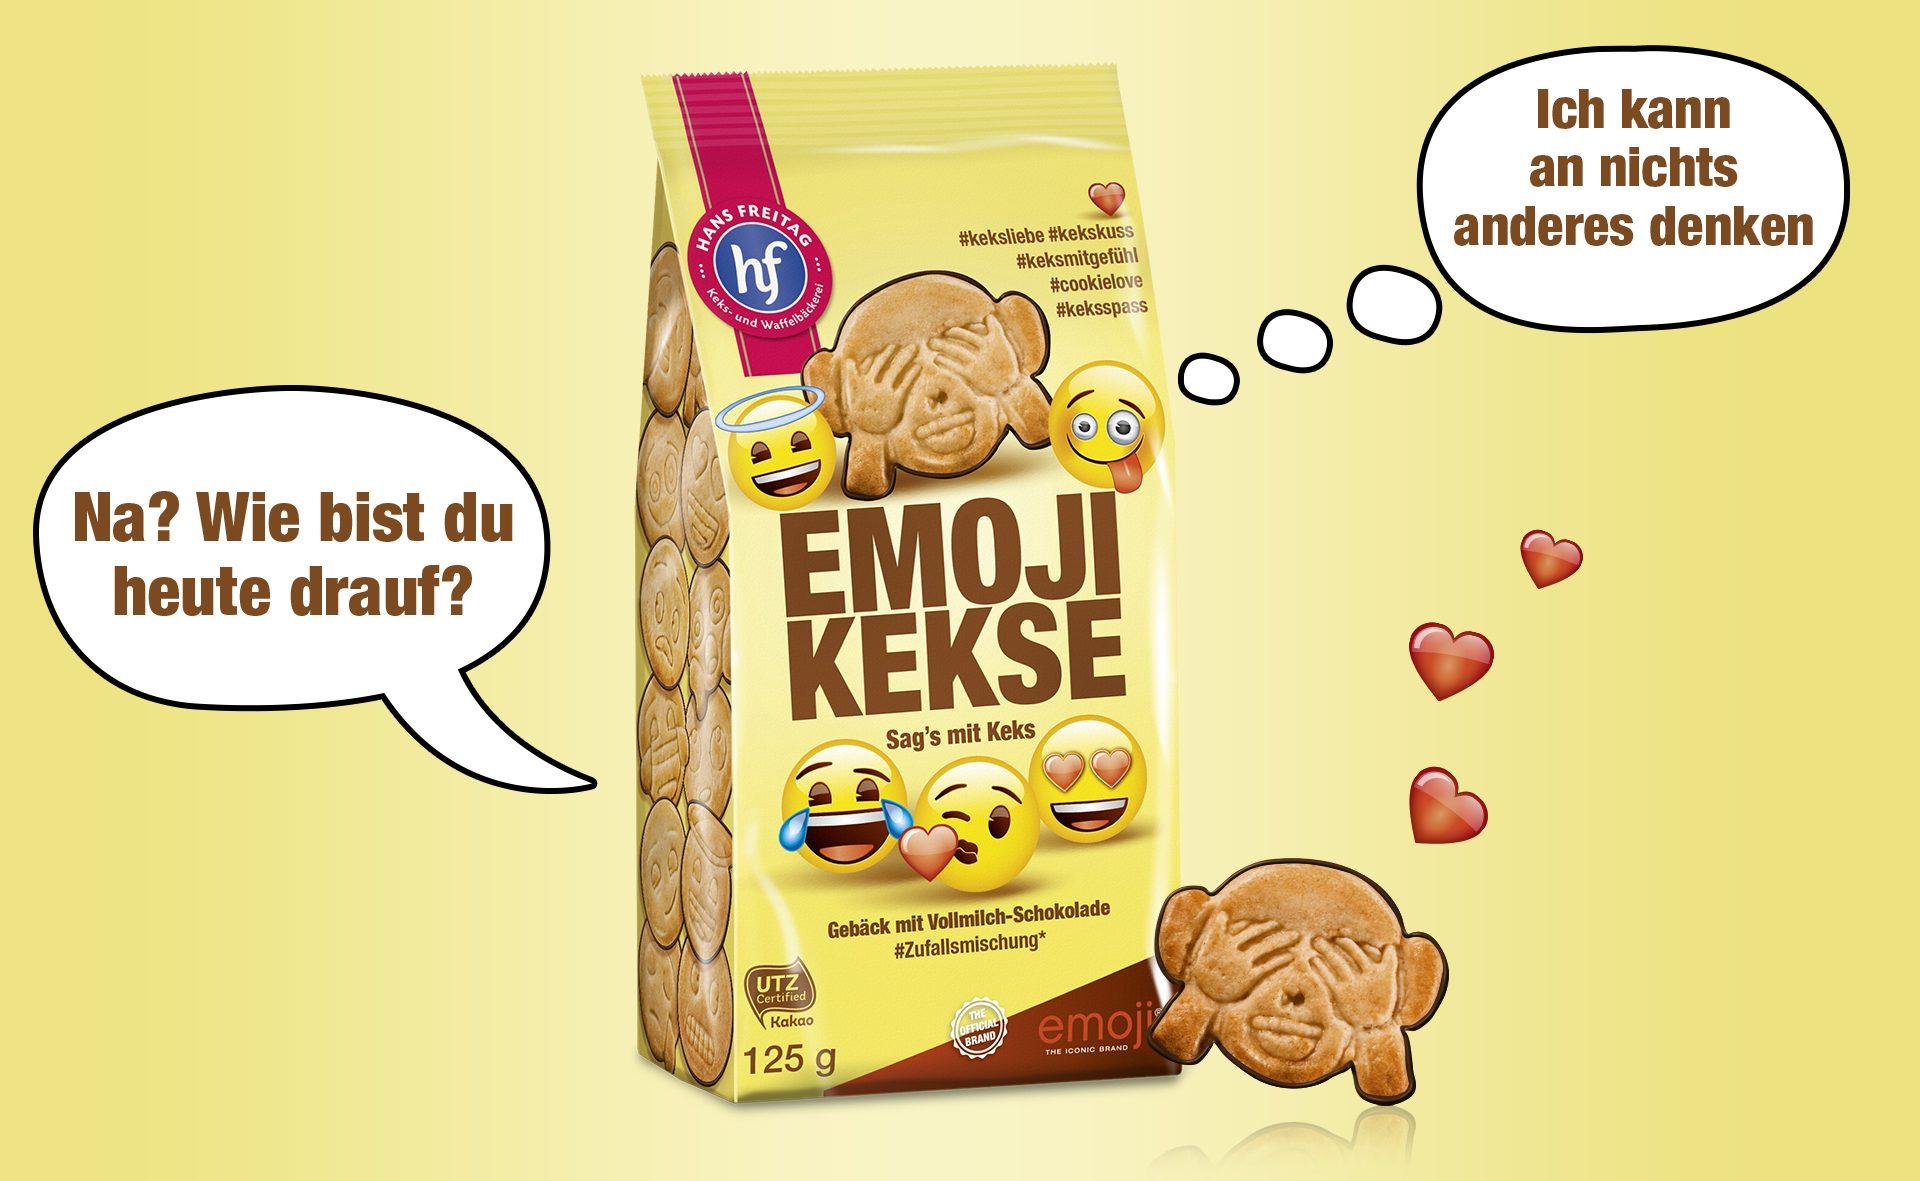 Verpackungsdesign Malvega: Hans Freitag Emoji Kekse